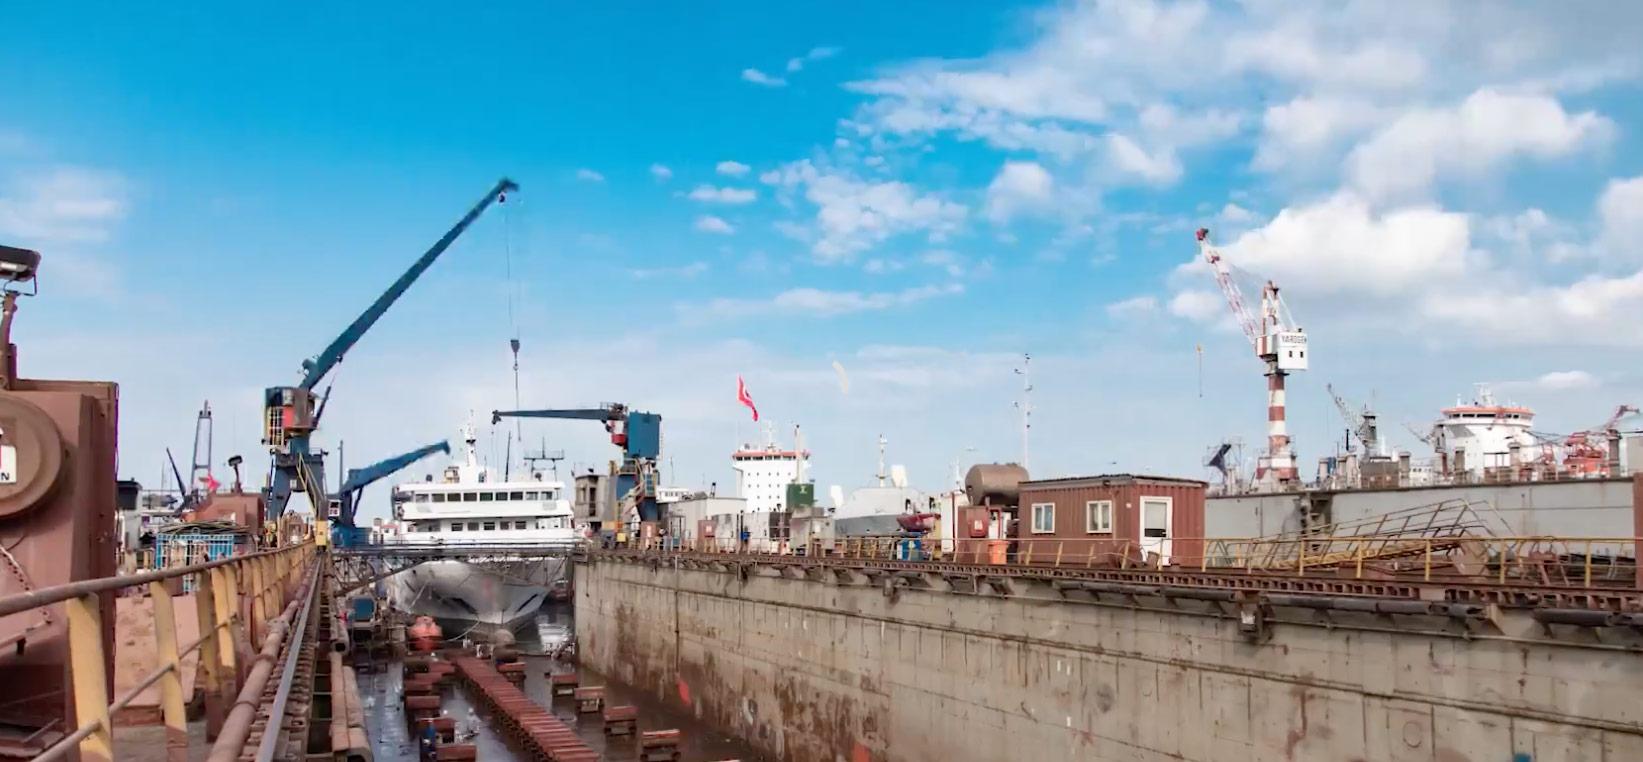 [object object] - hd videobackgrouund - Hidrodinamik Shipyard | Tuzla , Istanbul TURKEY- Home Page